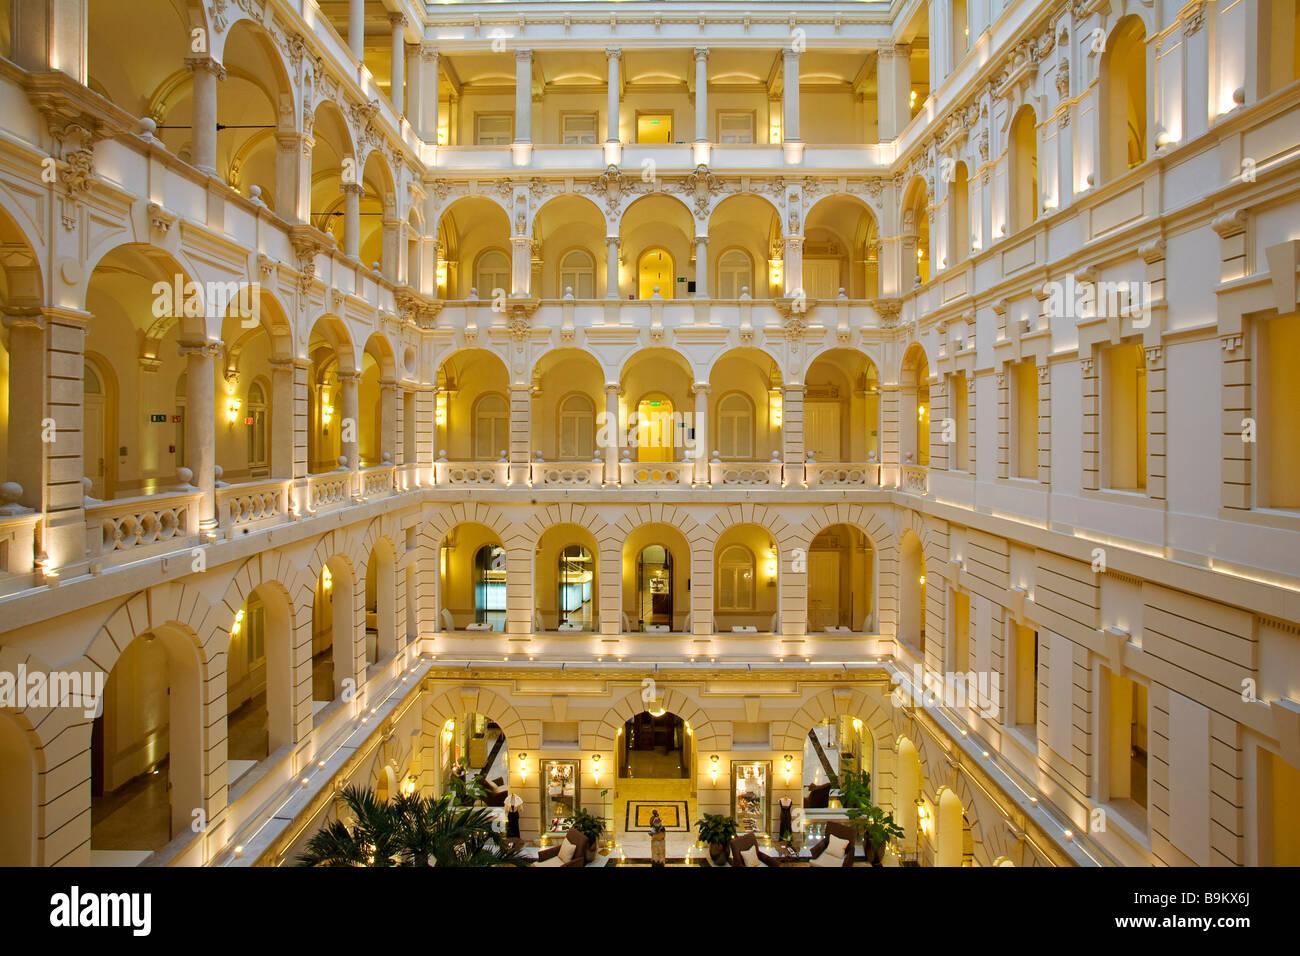 Hungary budapest new york palace 5 star luxury hotel for Hotel budapest